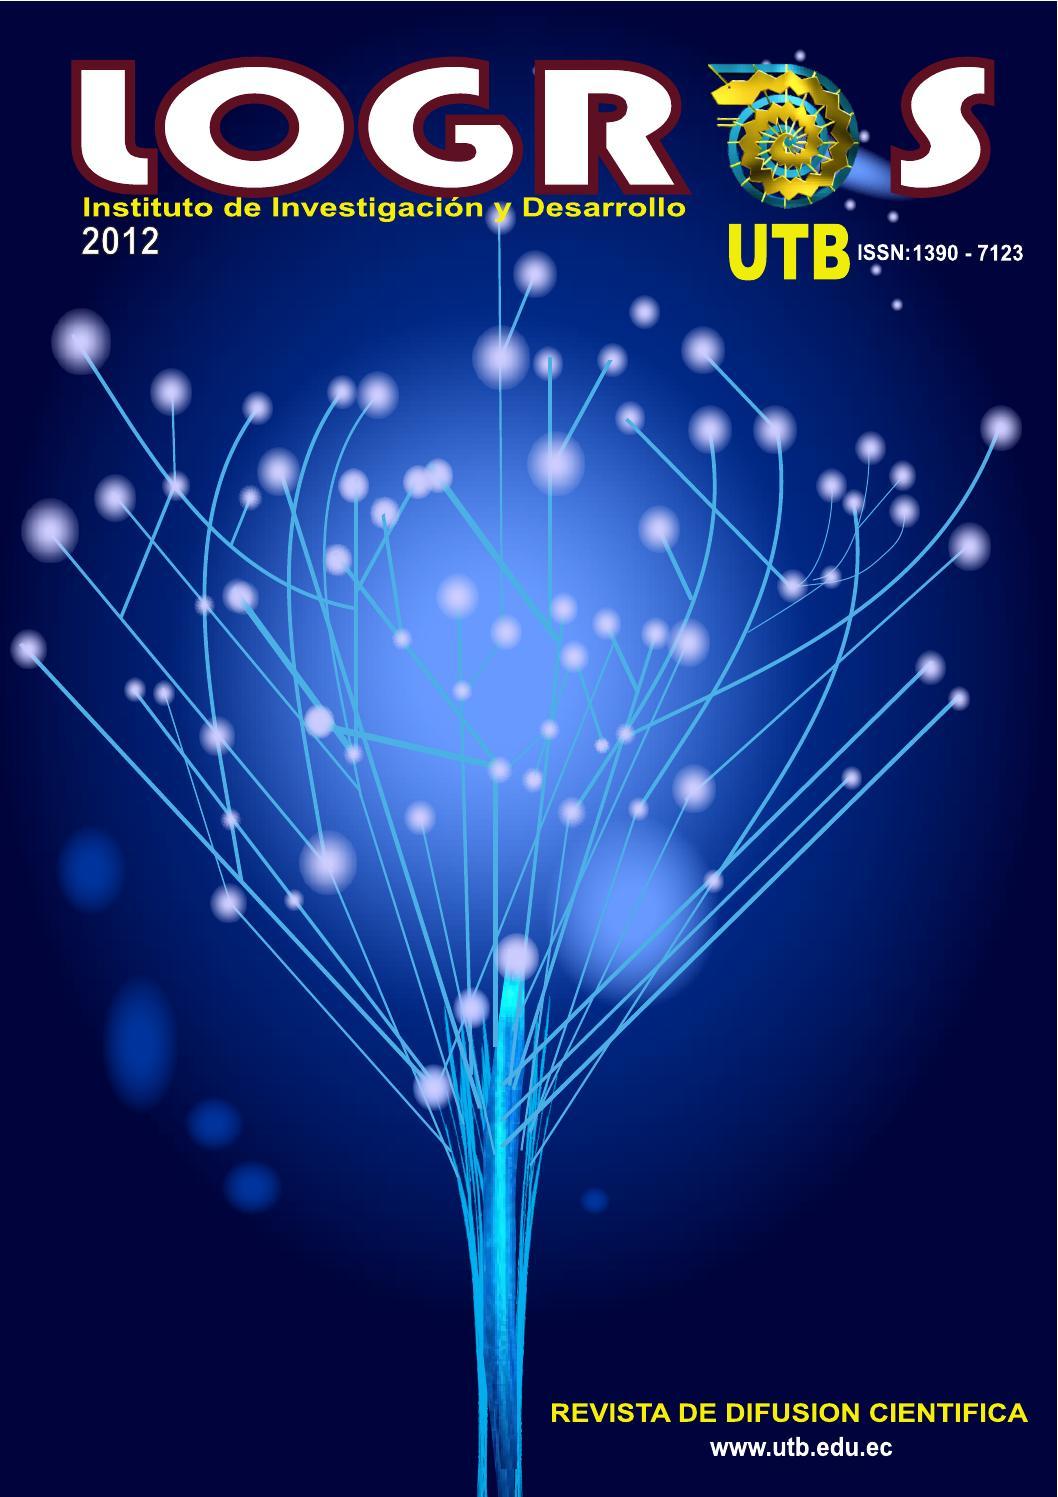 revista cient237fica logros 2012 by jorge alarc243n cadena issuu